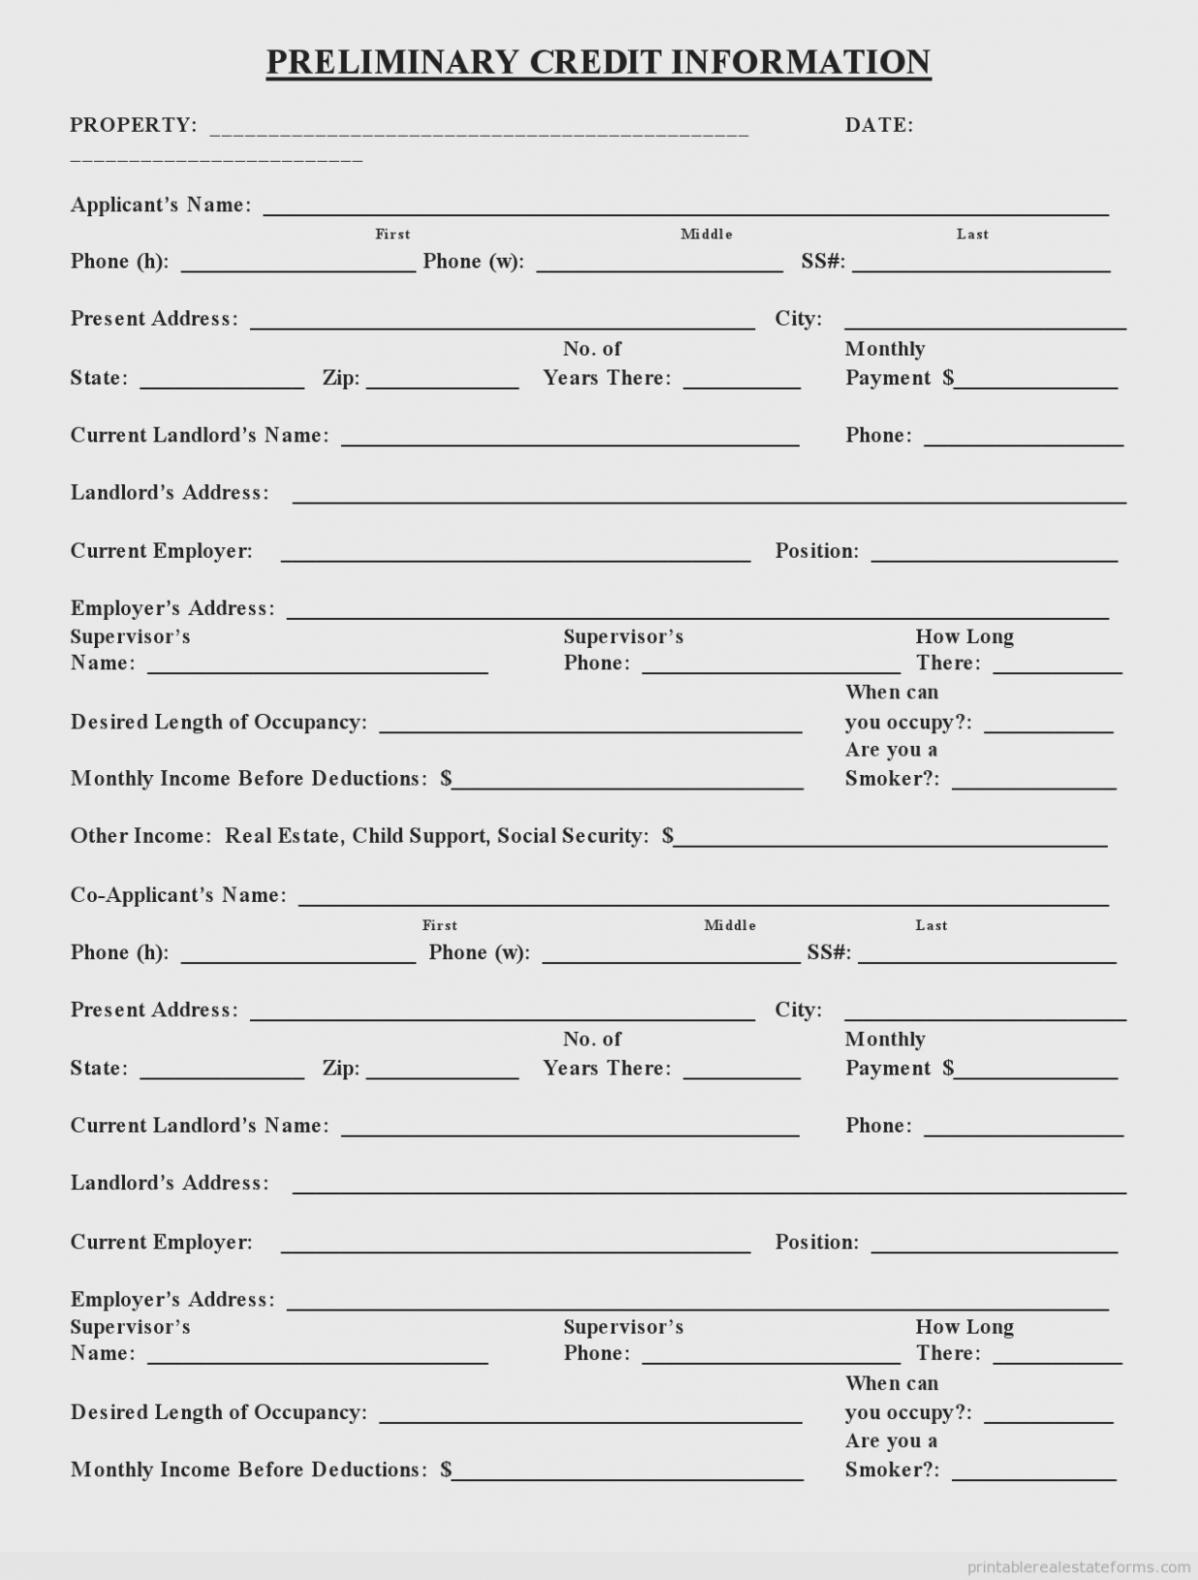 Transunion Printable Dispute Form 13 Best S Of Free Credit Report - Free Printable Credit Report